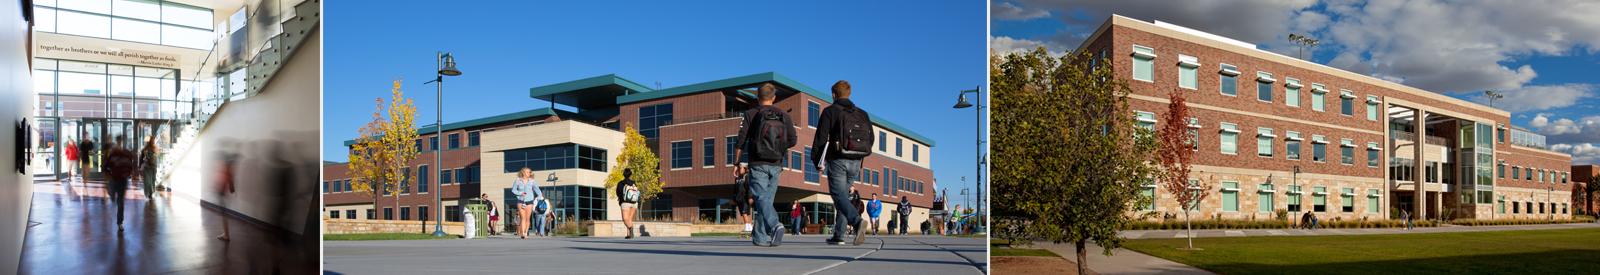 colorado state university admissions essay